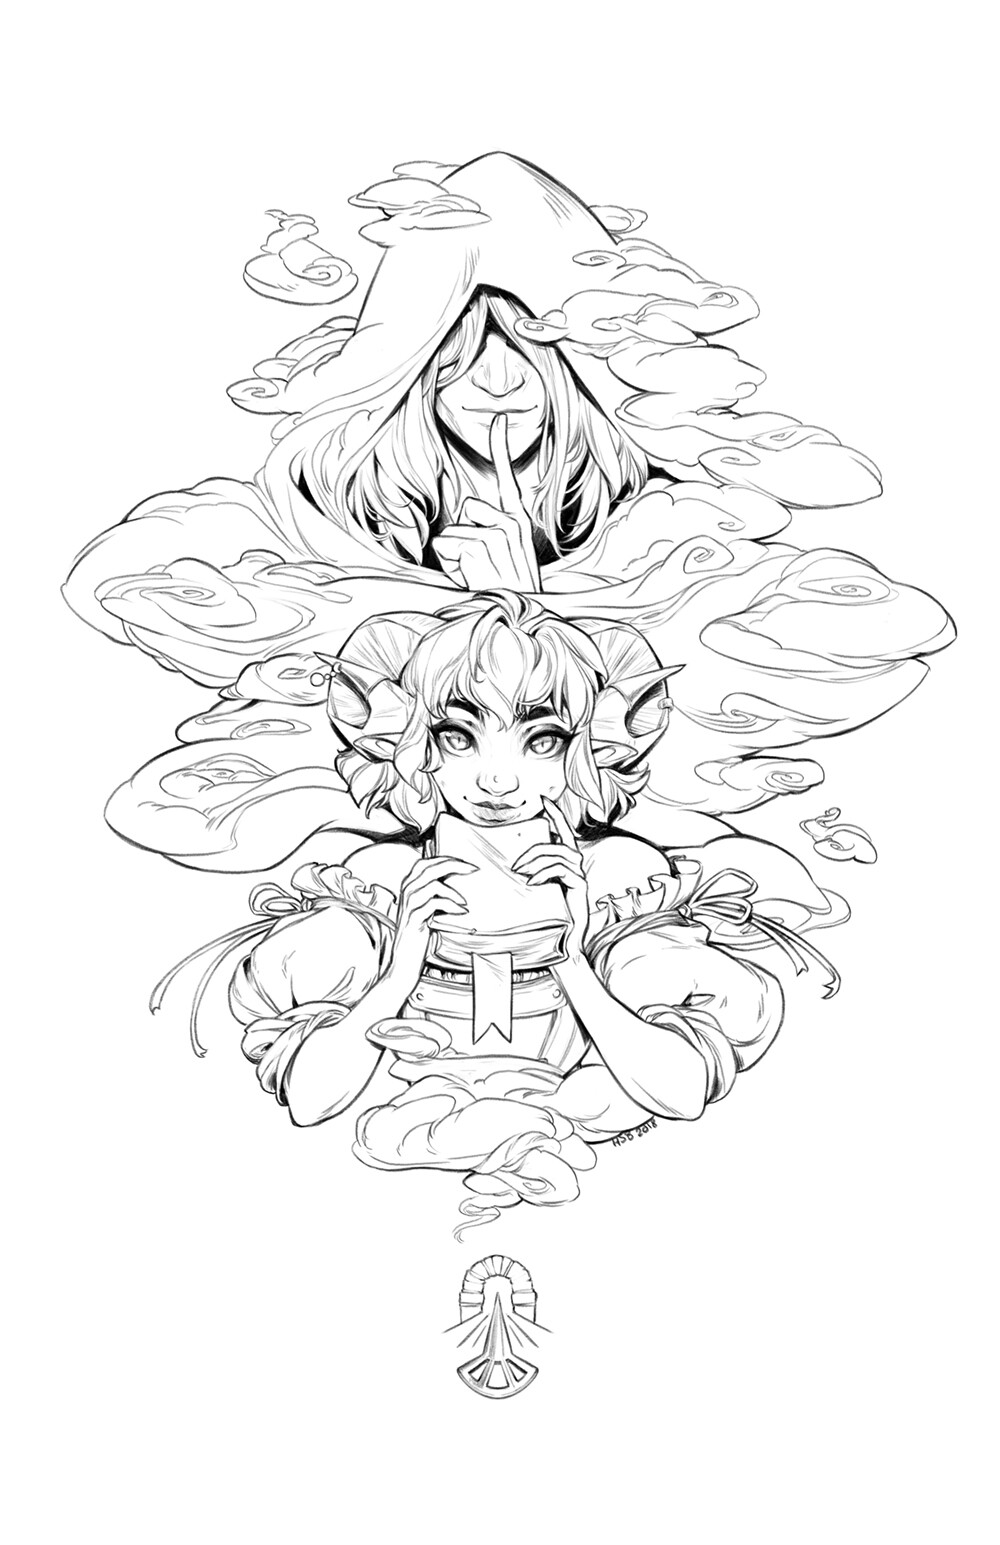 Hunter bonyun critrole charms jester